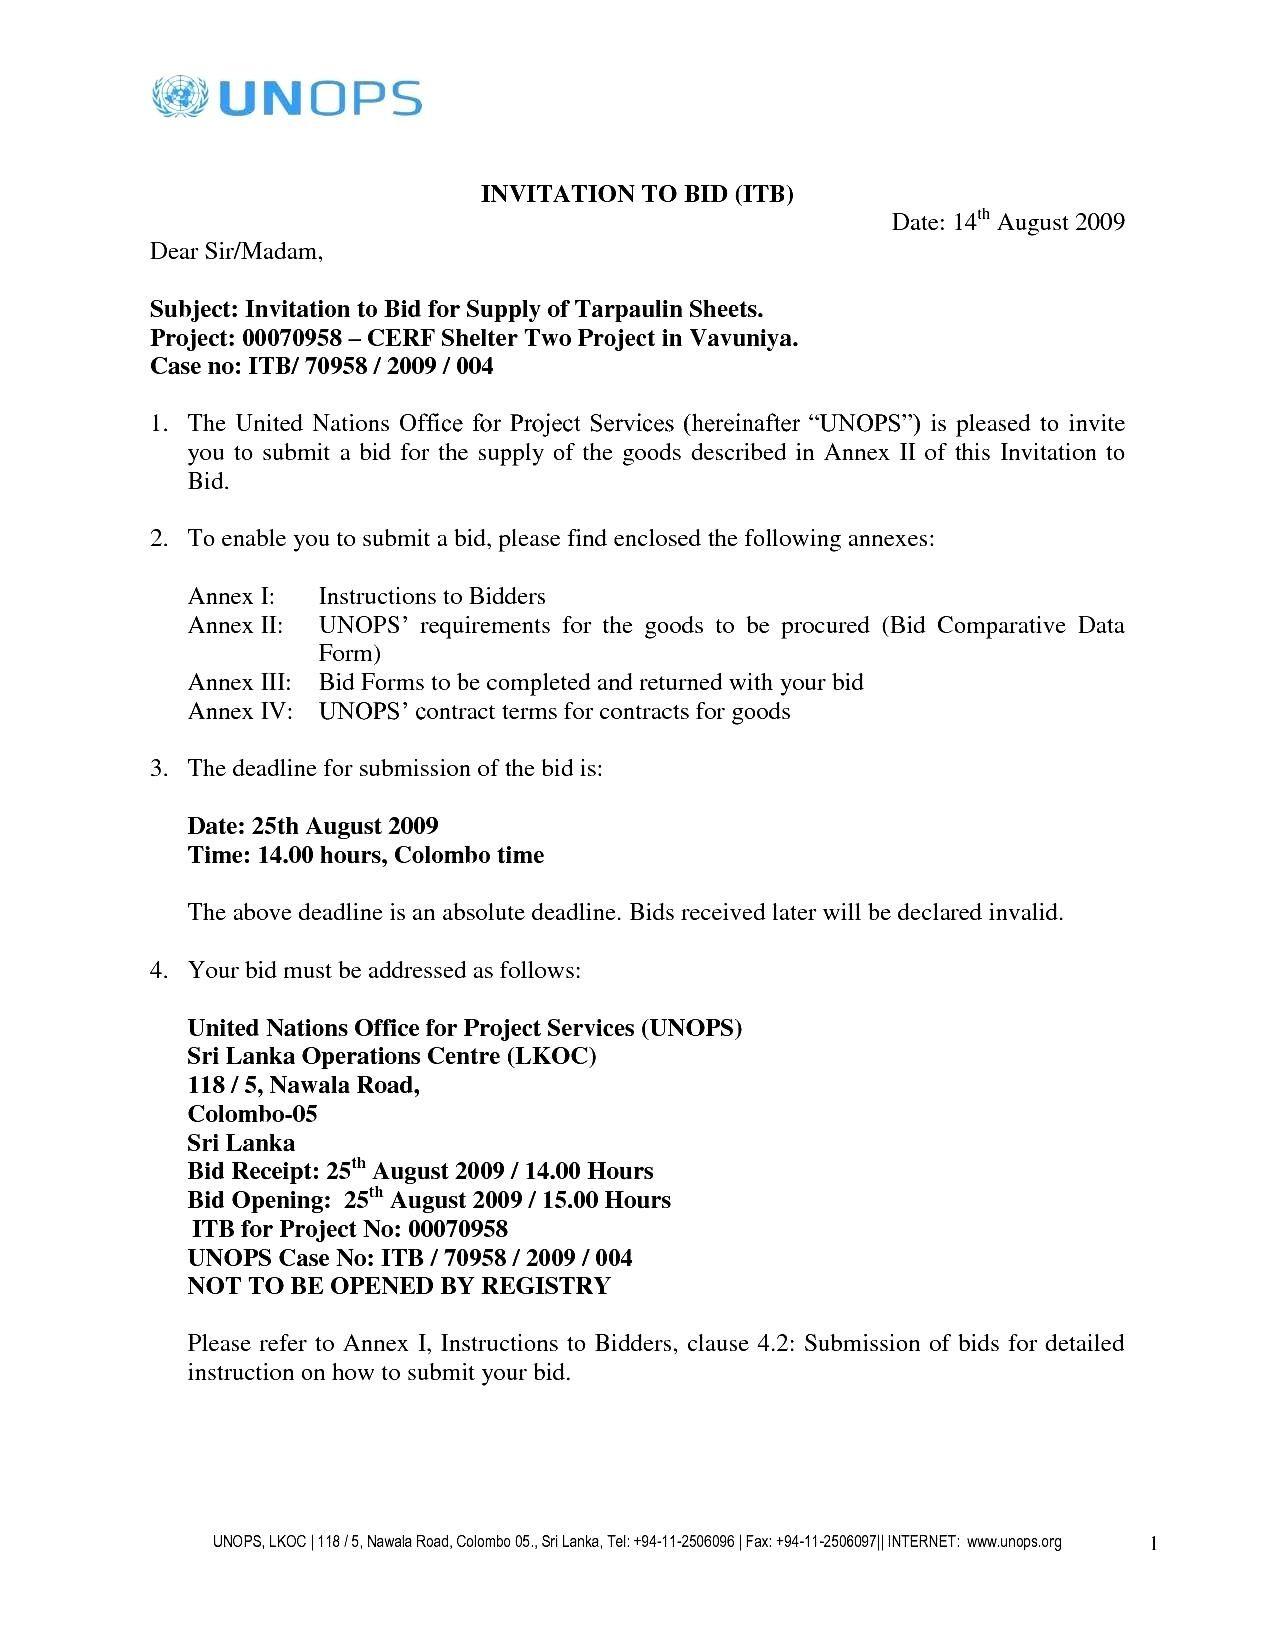 formal party invitation letter exampleofautomaticreplies